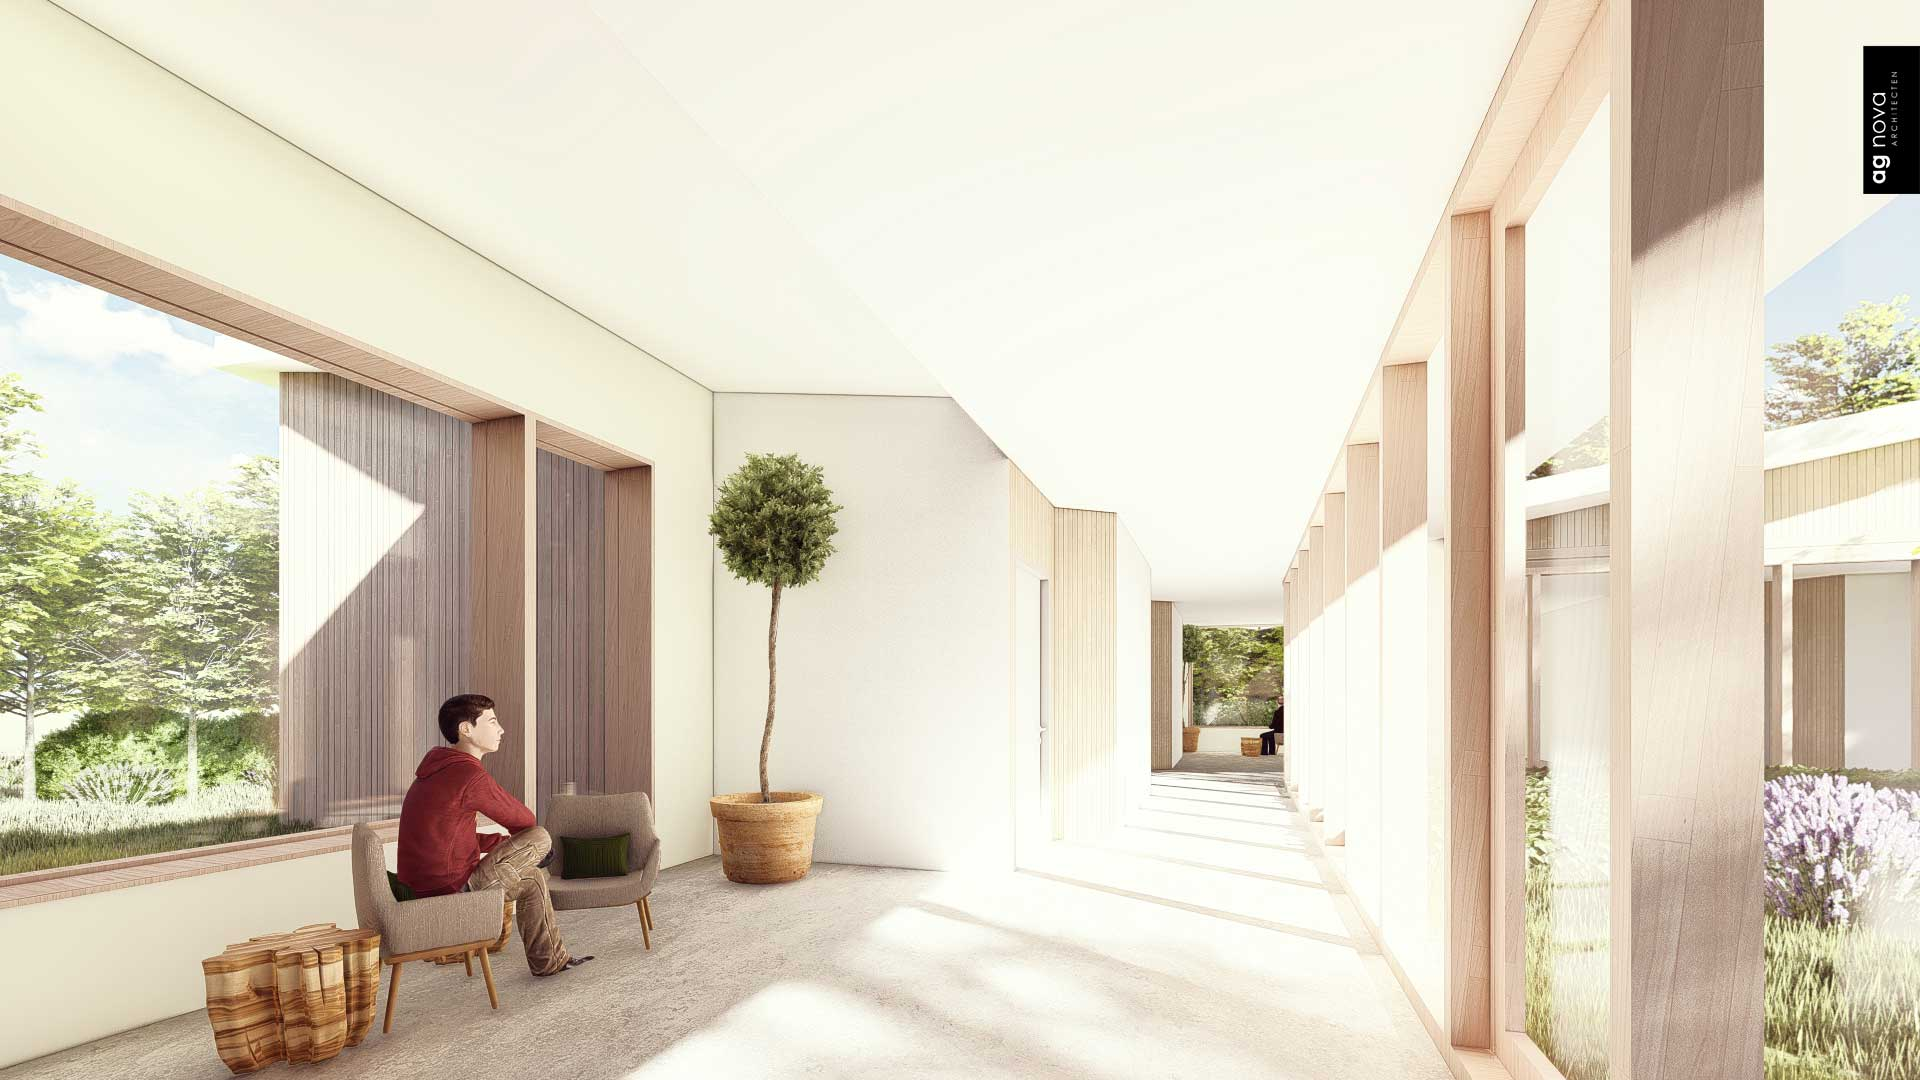 ag nova architecten-Alkmaar Kees Boekestraat